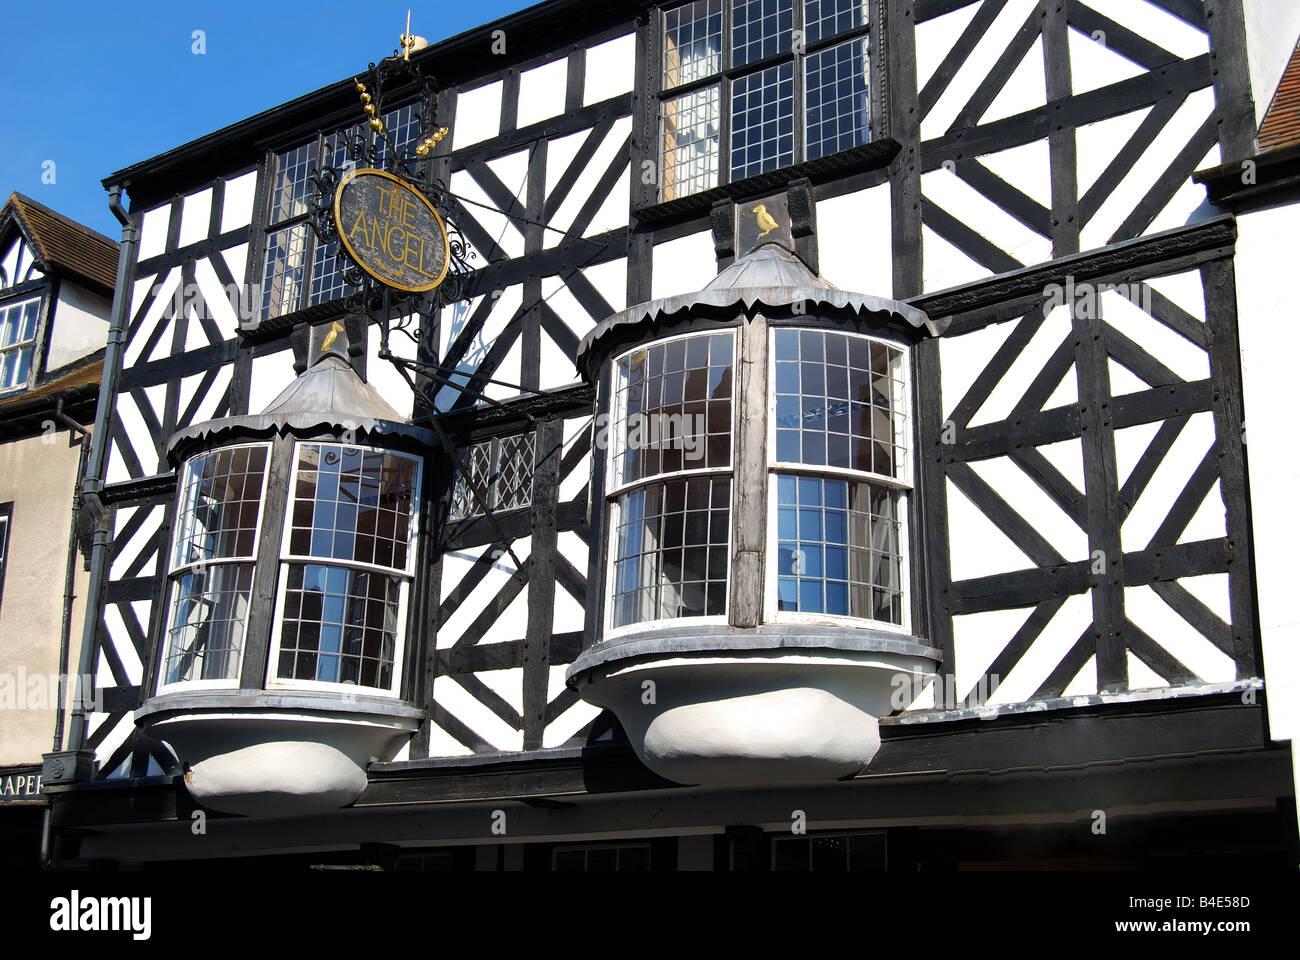 El Ángel, Tudor House fachada, Broad Street, Ludlow, Shropshire, Inglaterra, Reino Unido Imagen De Stock